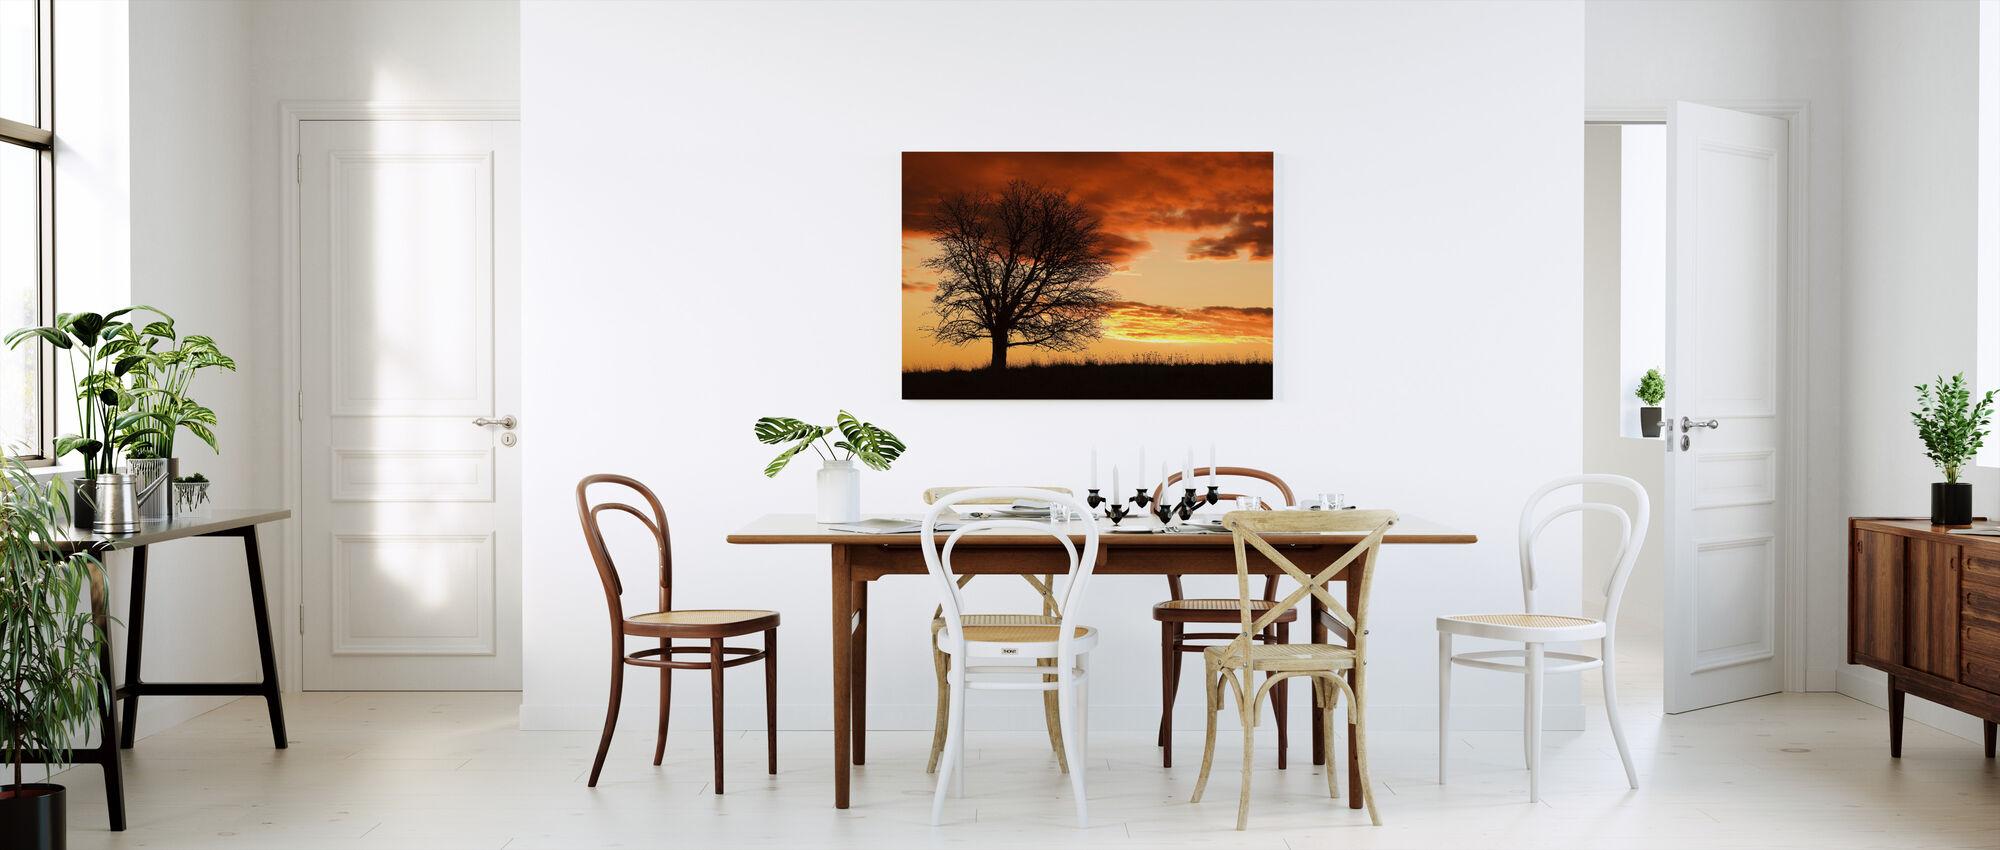 Puu auringonlaskussa - Canvastaulu - Keittiö